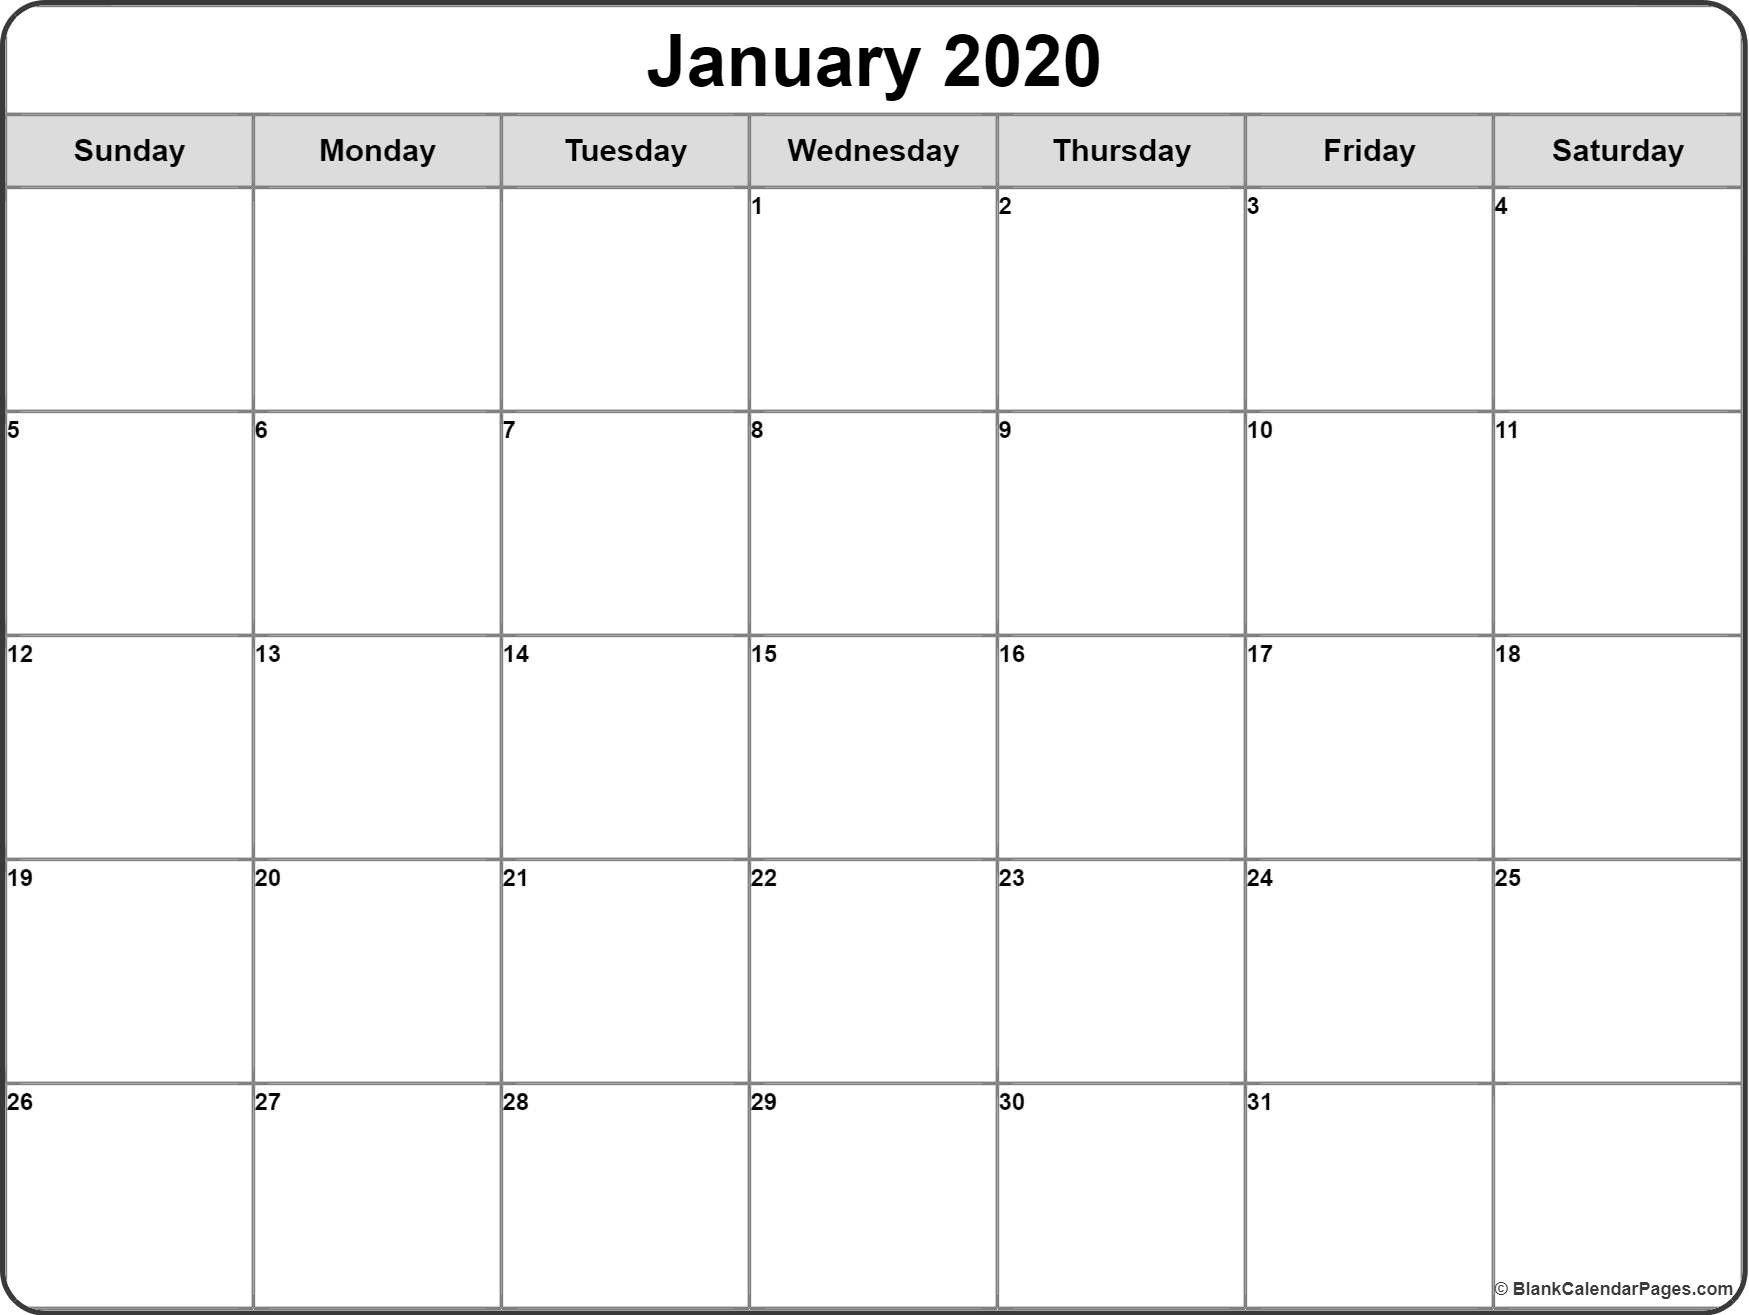 January 2020 Calendar May 2020 Printable Calander 2020